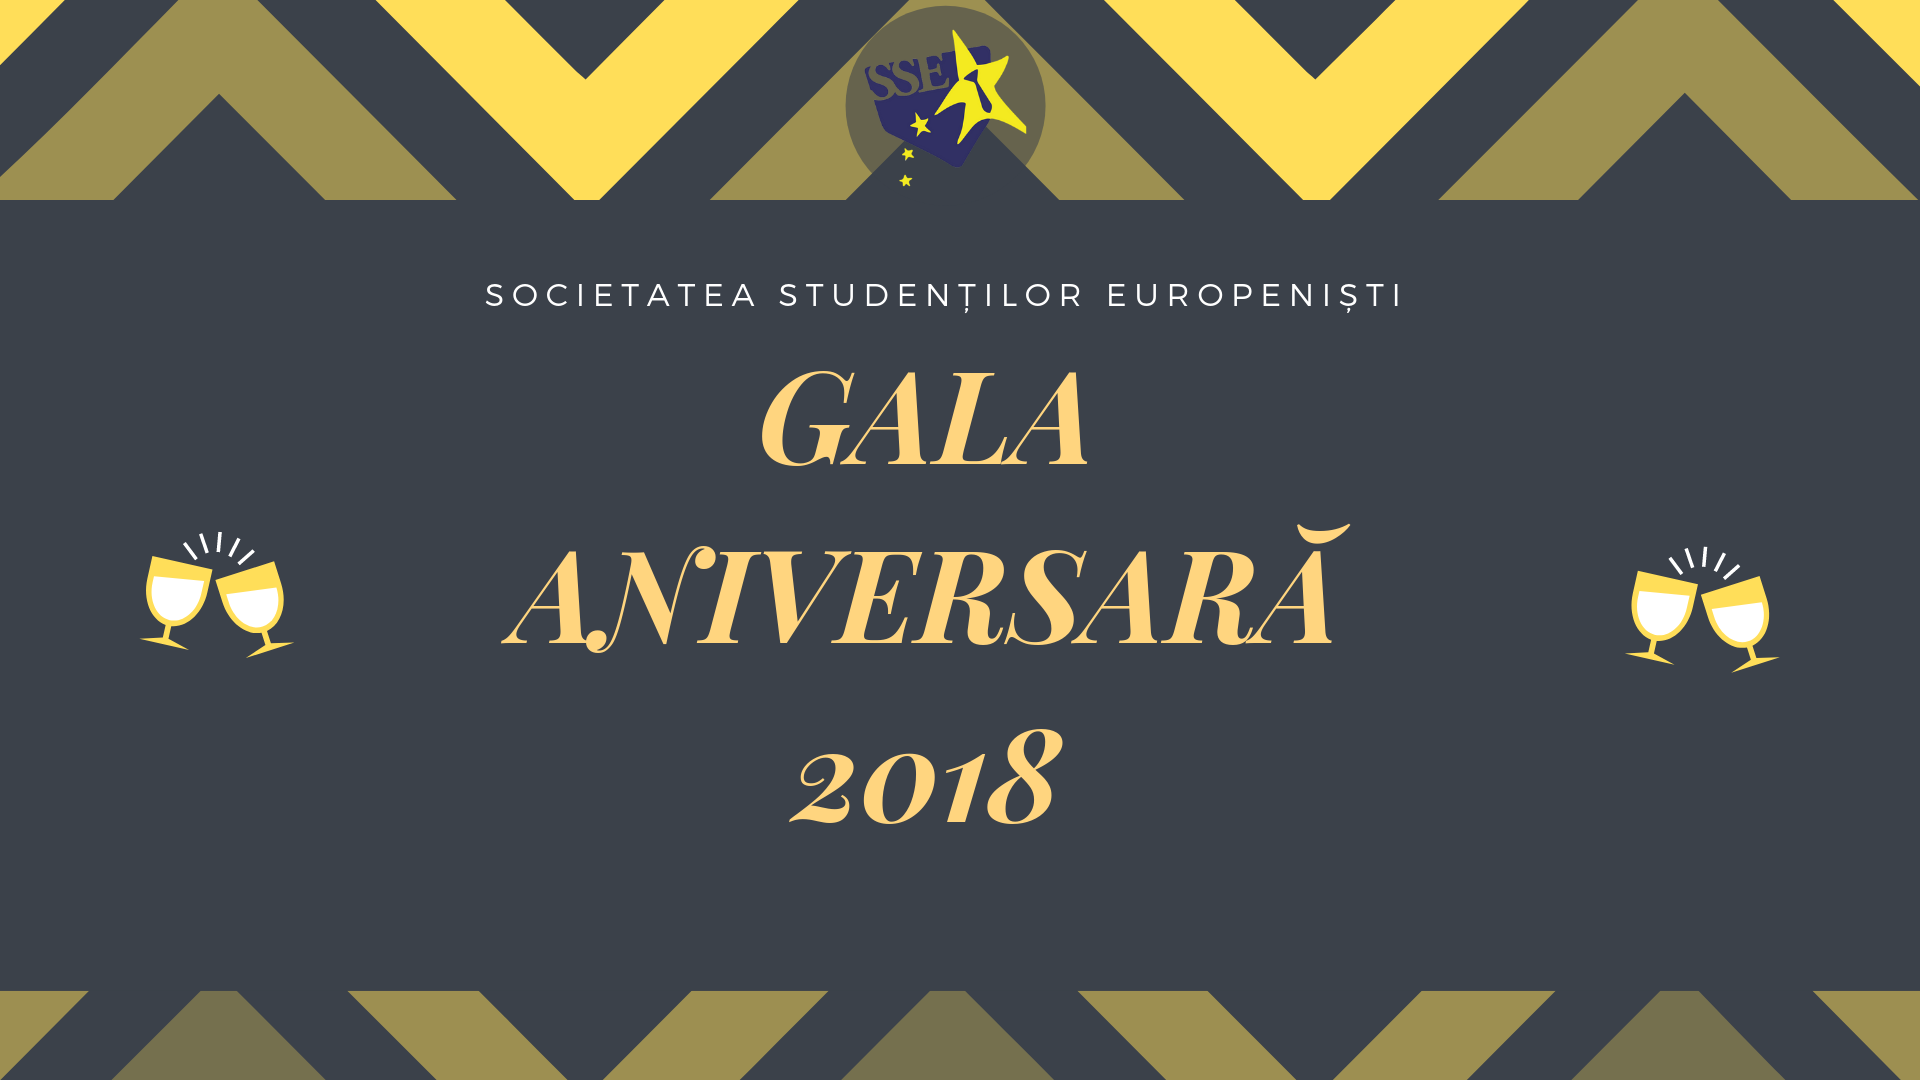 Gala Aniversară SSE 2018